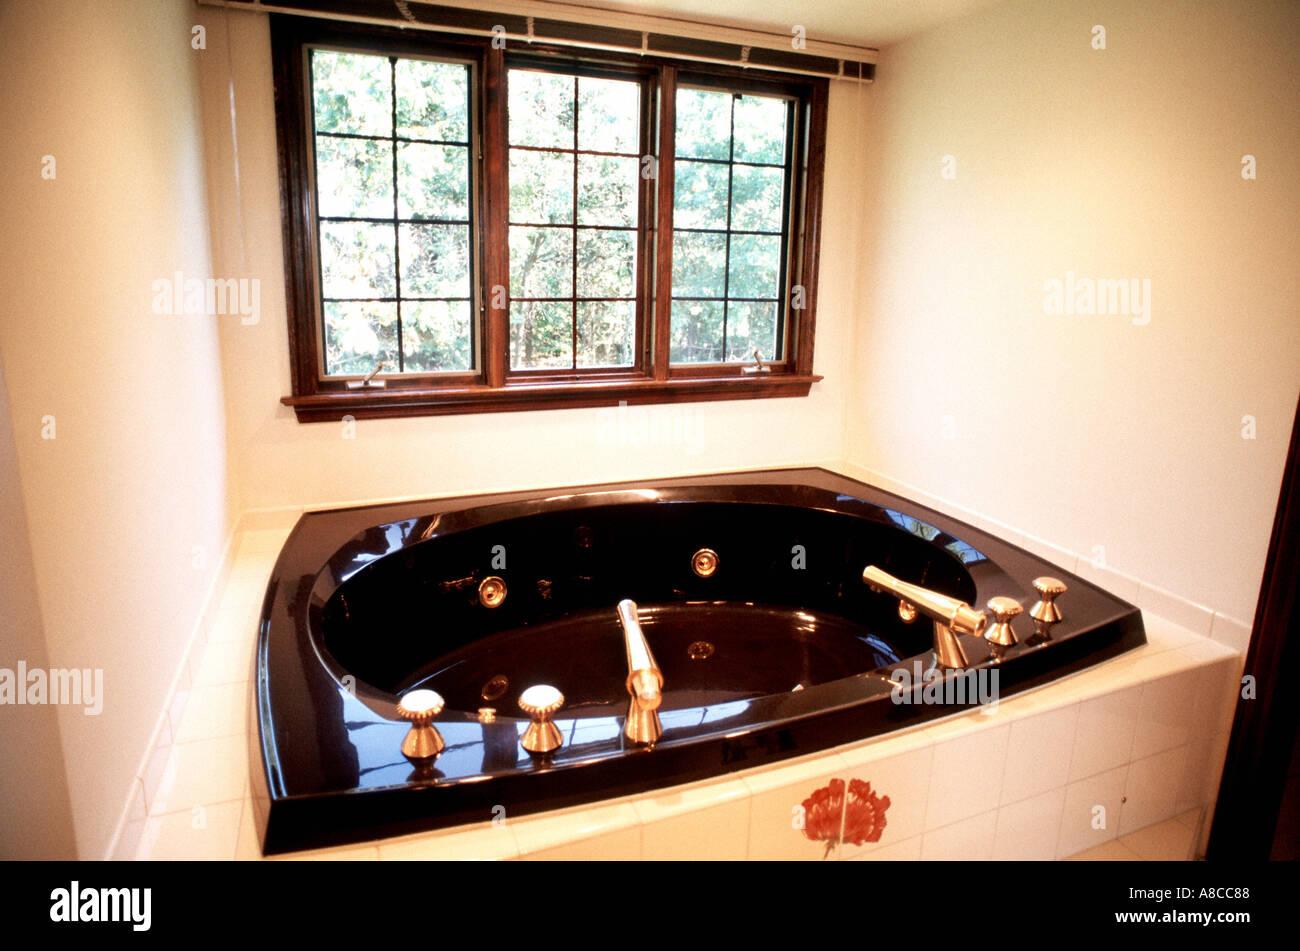 Benutzerdefinierte Haus innen Pittsburgh PA USA American Whirlpool ...